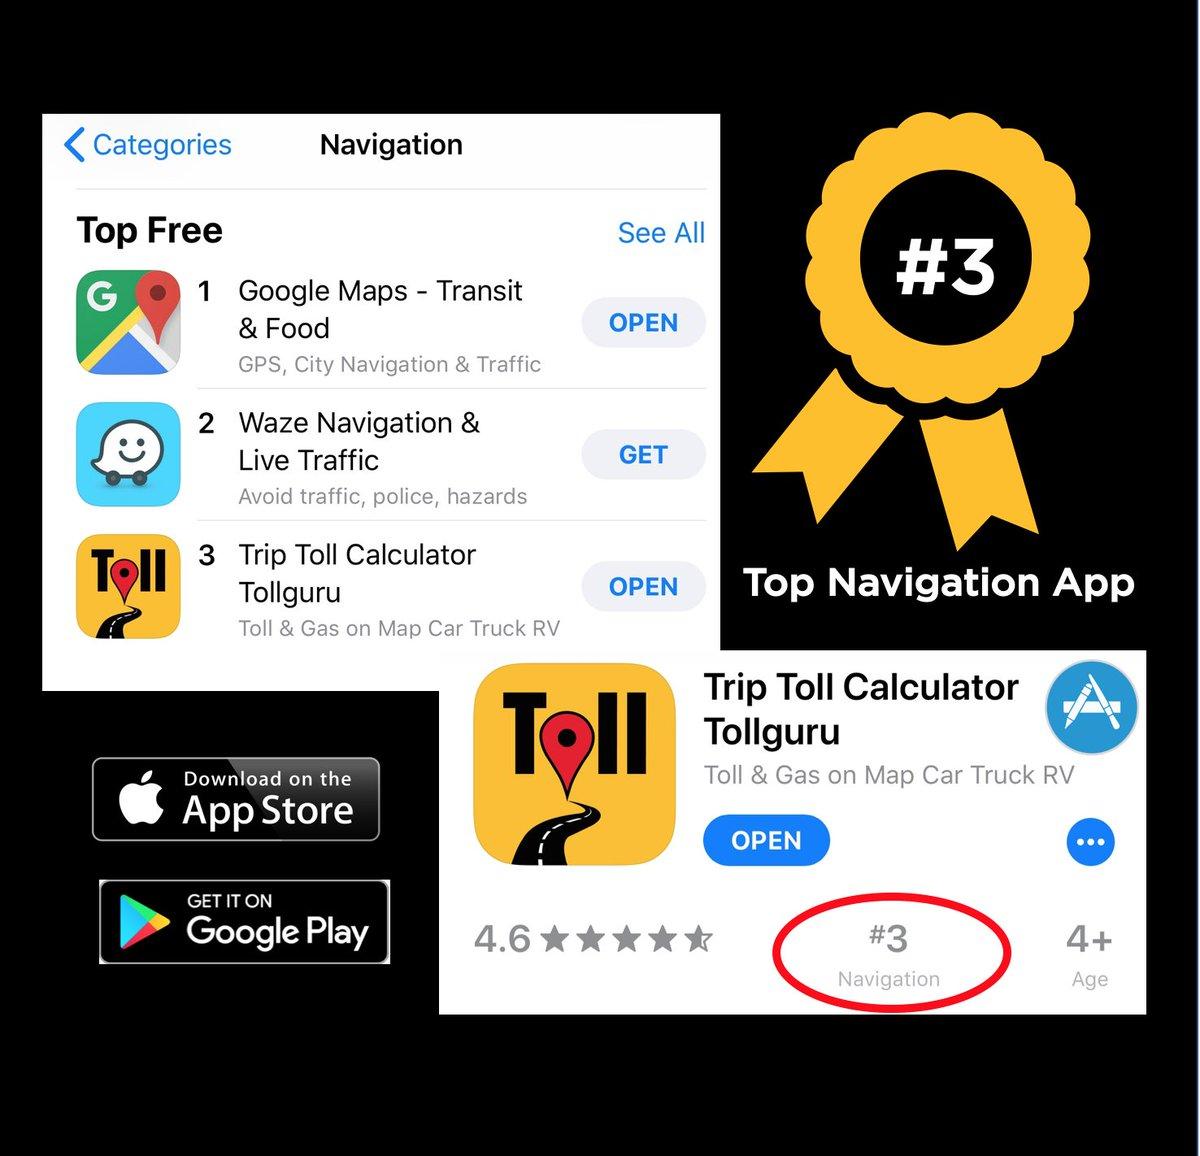 TollGuru ranked top #3 in @AppStore Navigation apps